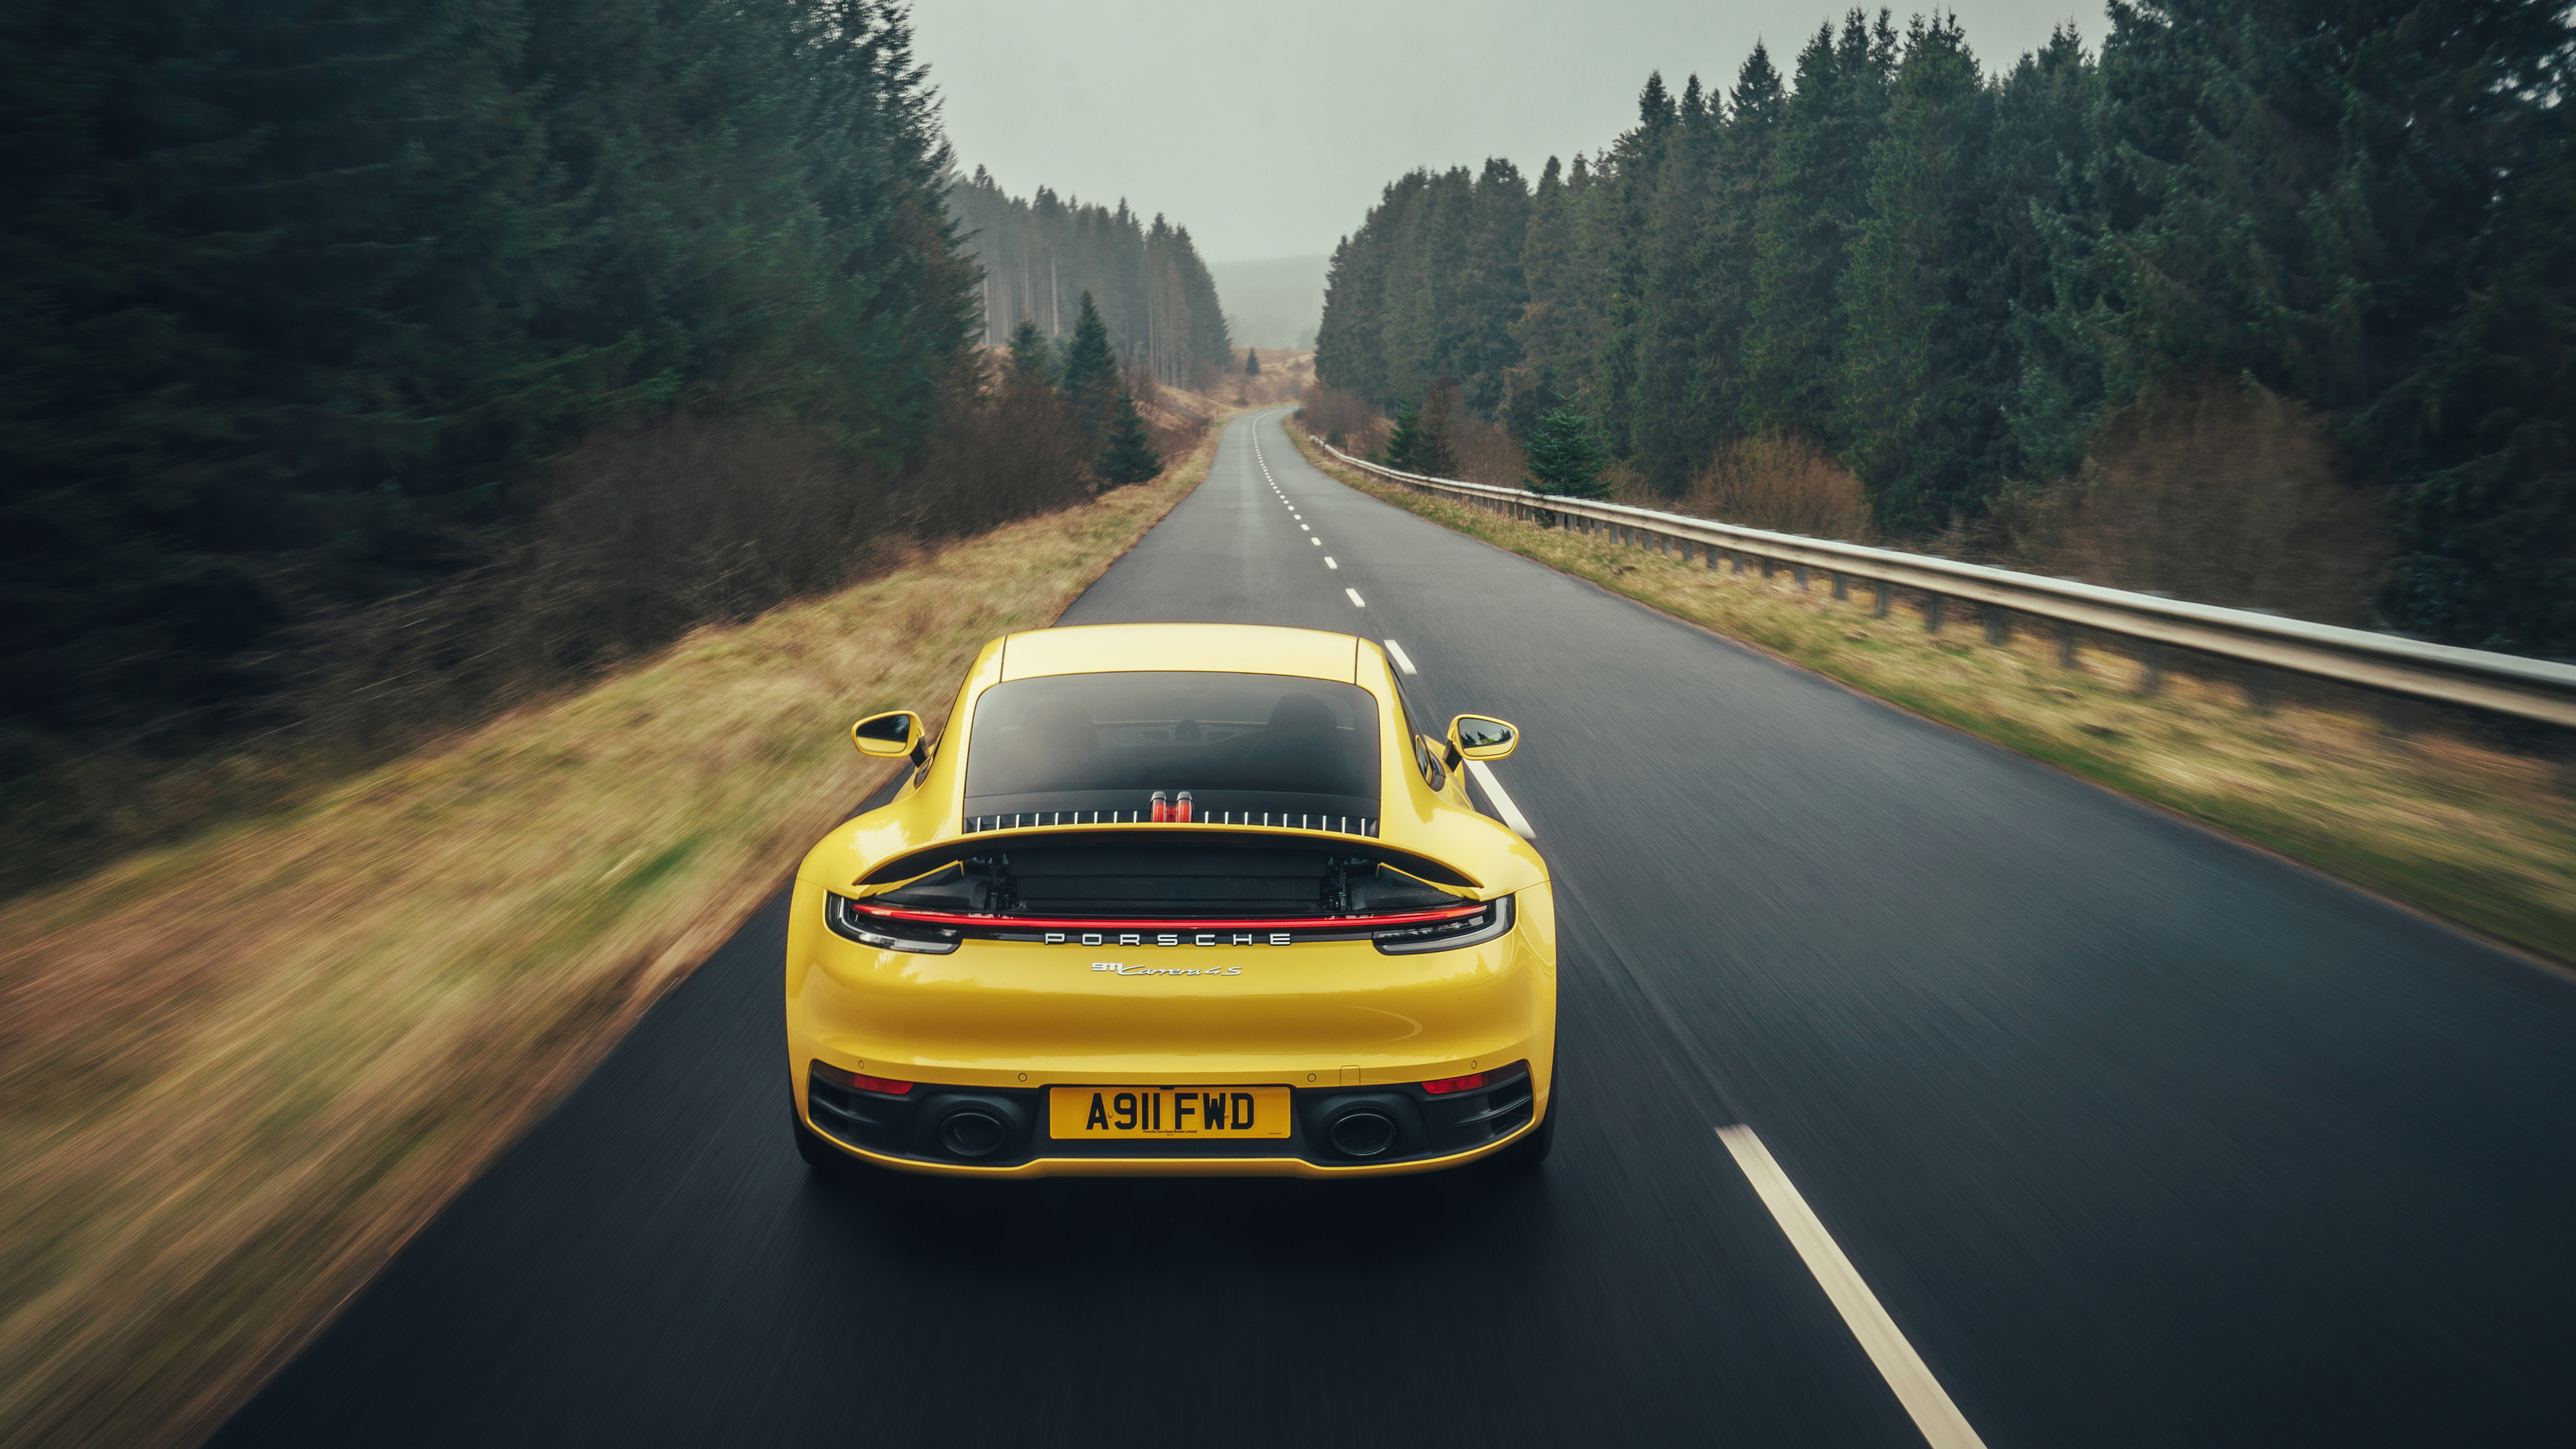 porsche 911 carrera 2019 4s 4k 1556185170 - Porsche 911 Carrera 2019 4s 4k - porsche wallpapers, porsche 911 wallpapers, hd-wallpapers, cars wallpapers, 5k wallpapers, 4k-wallpapers